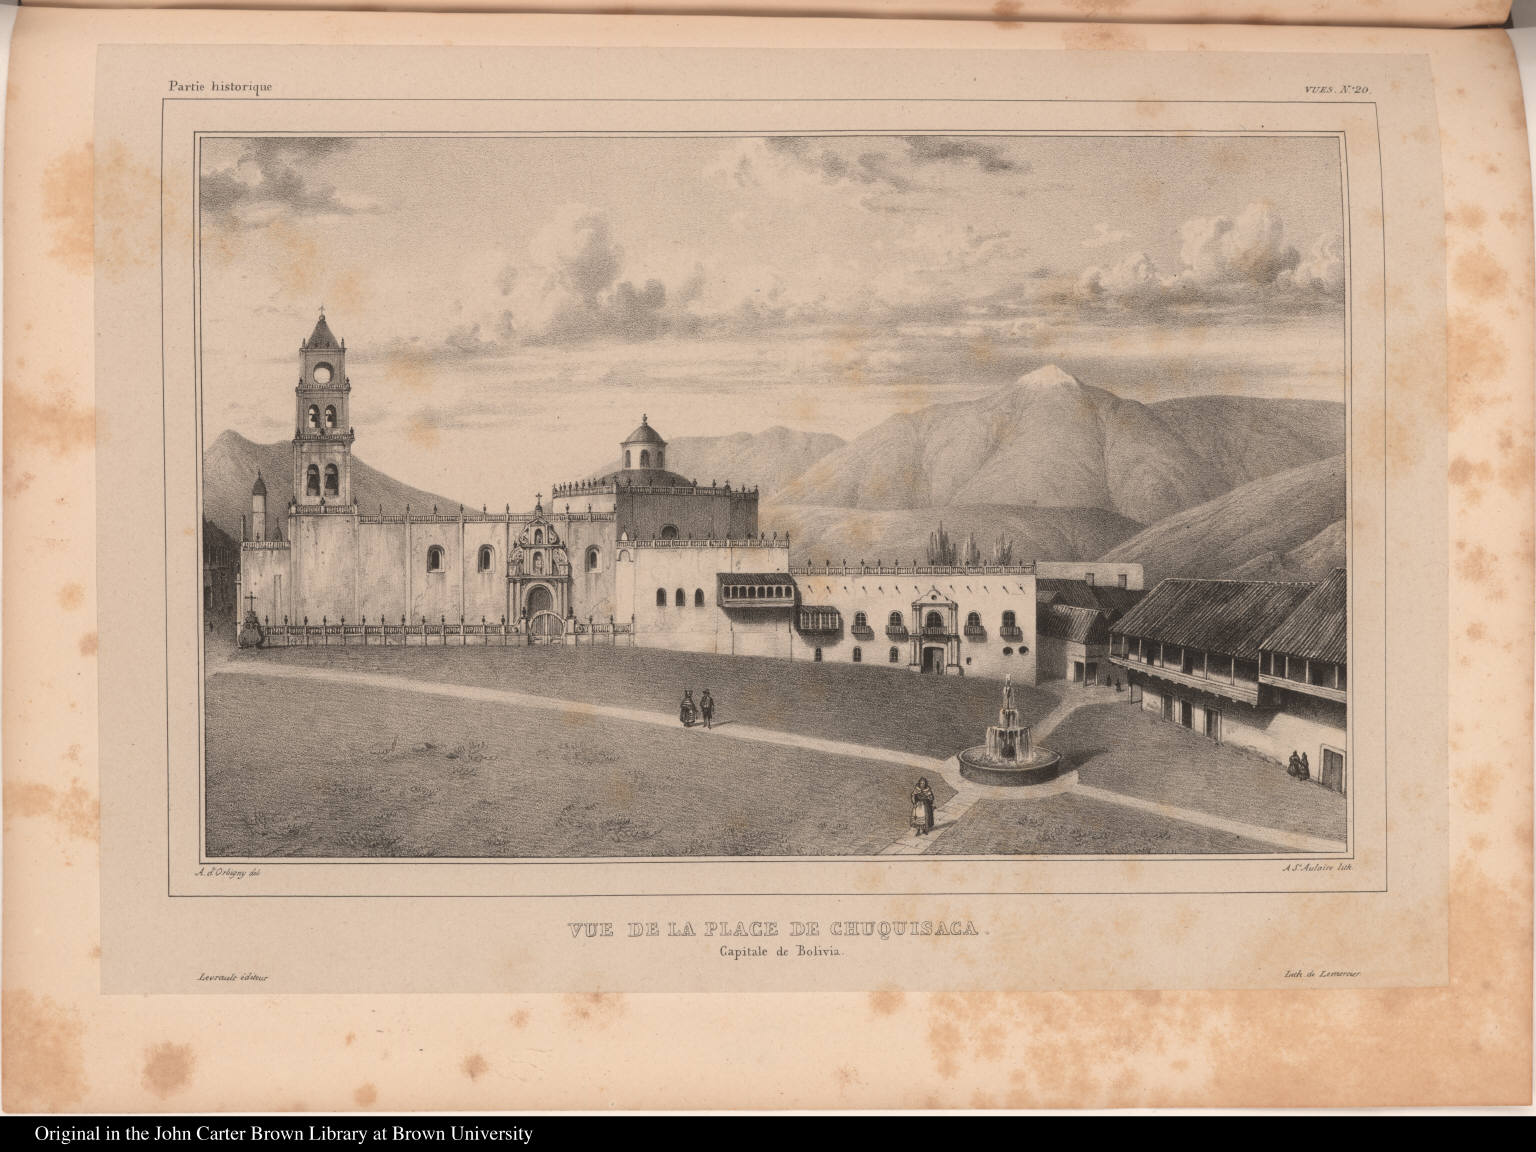 Vue de la Place de Chuquisaca. Capitale de Bolivia.